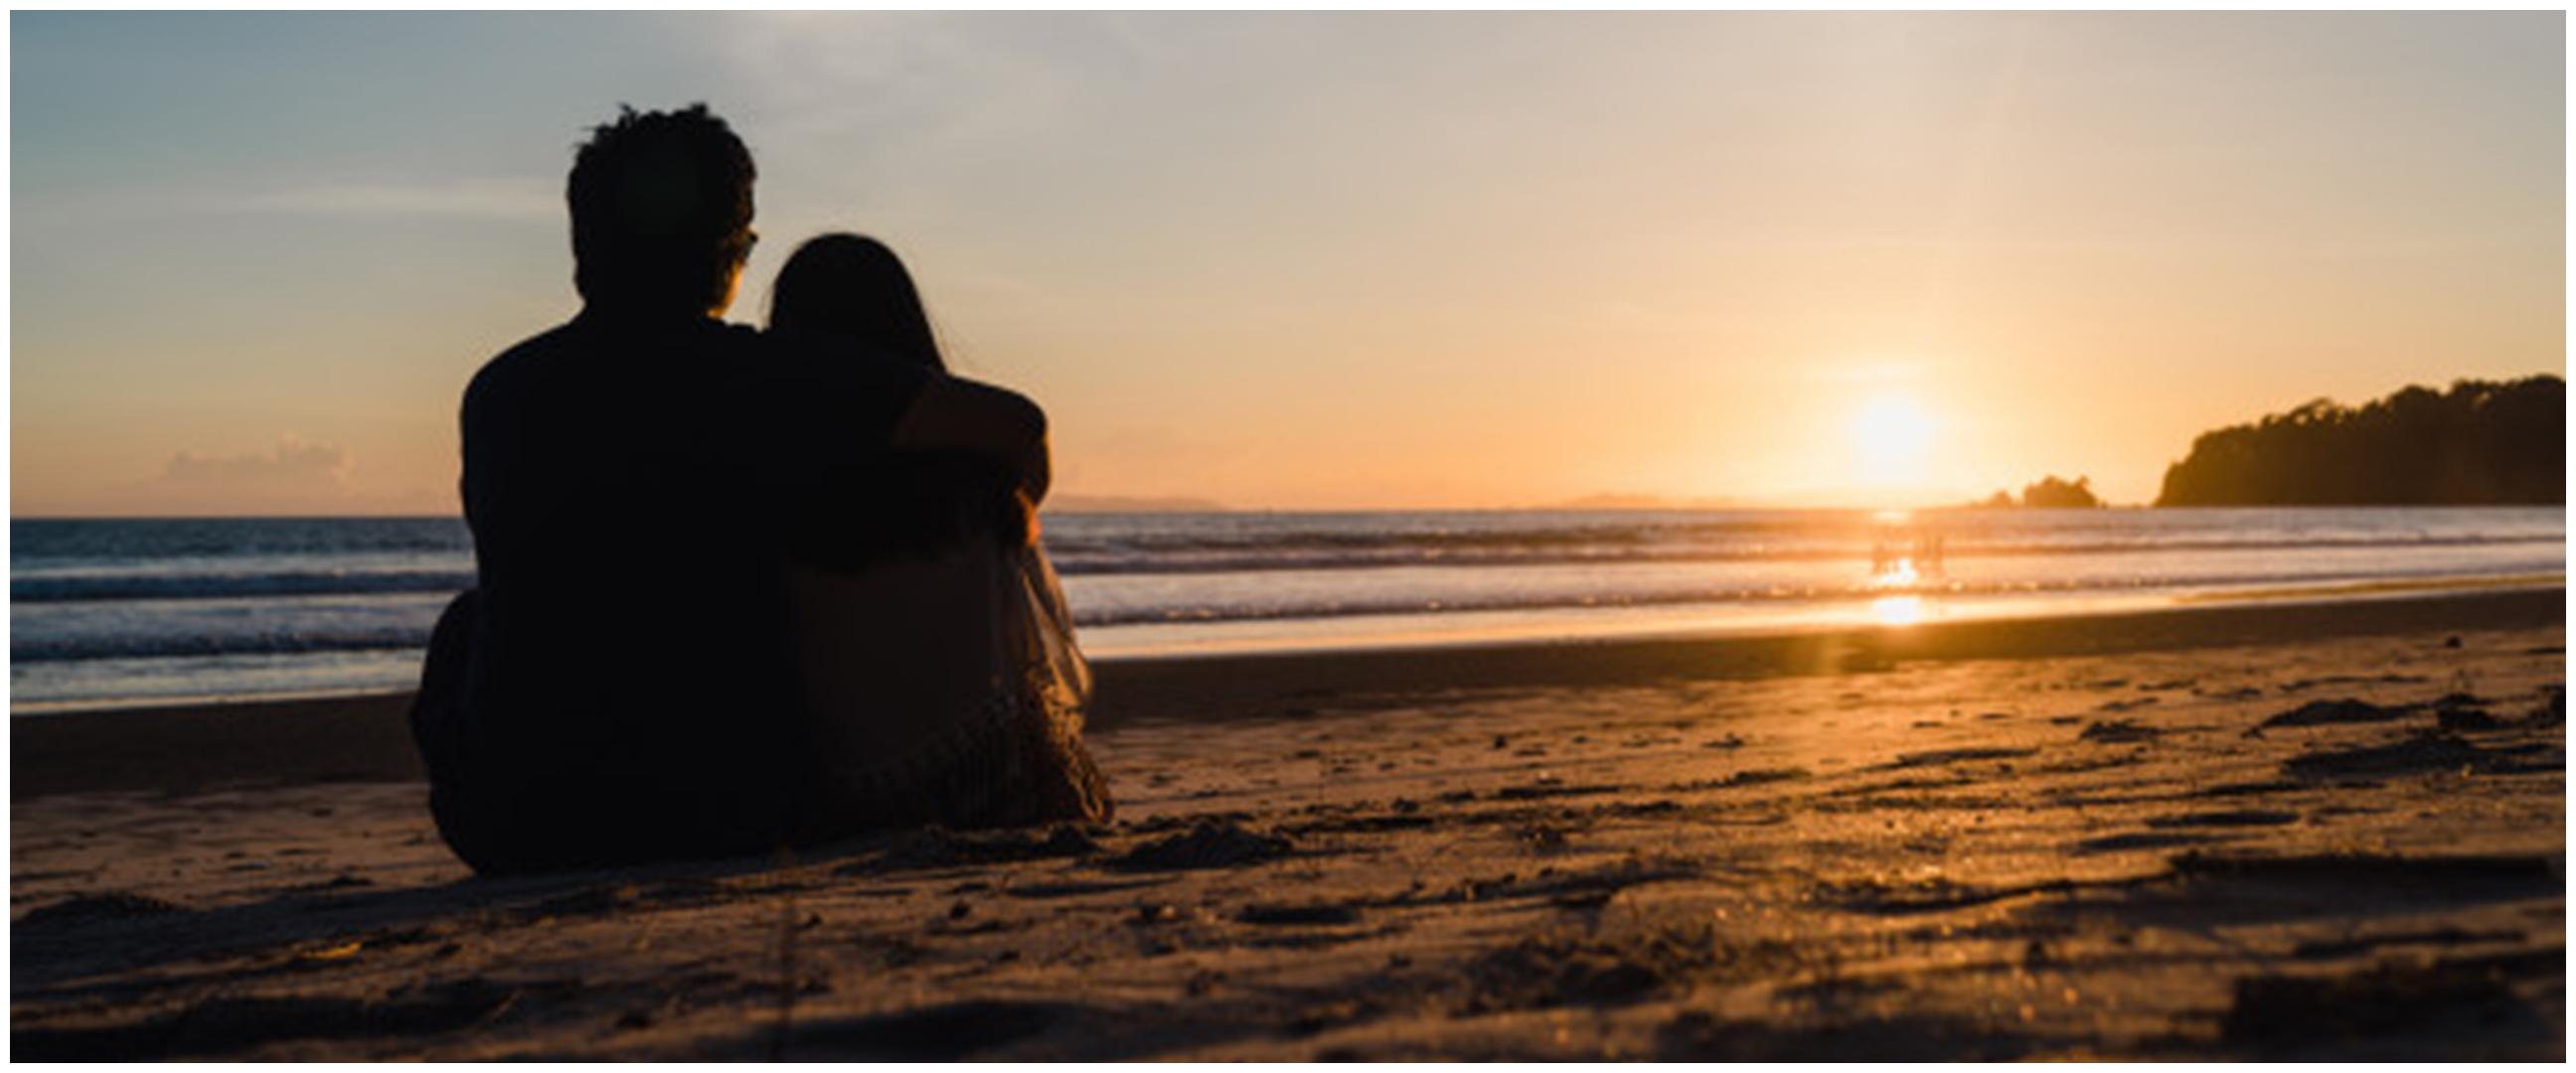 50 Kata-kata mutiara manisnya cinta, bikin hubungan makin lengket